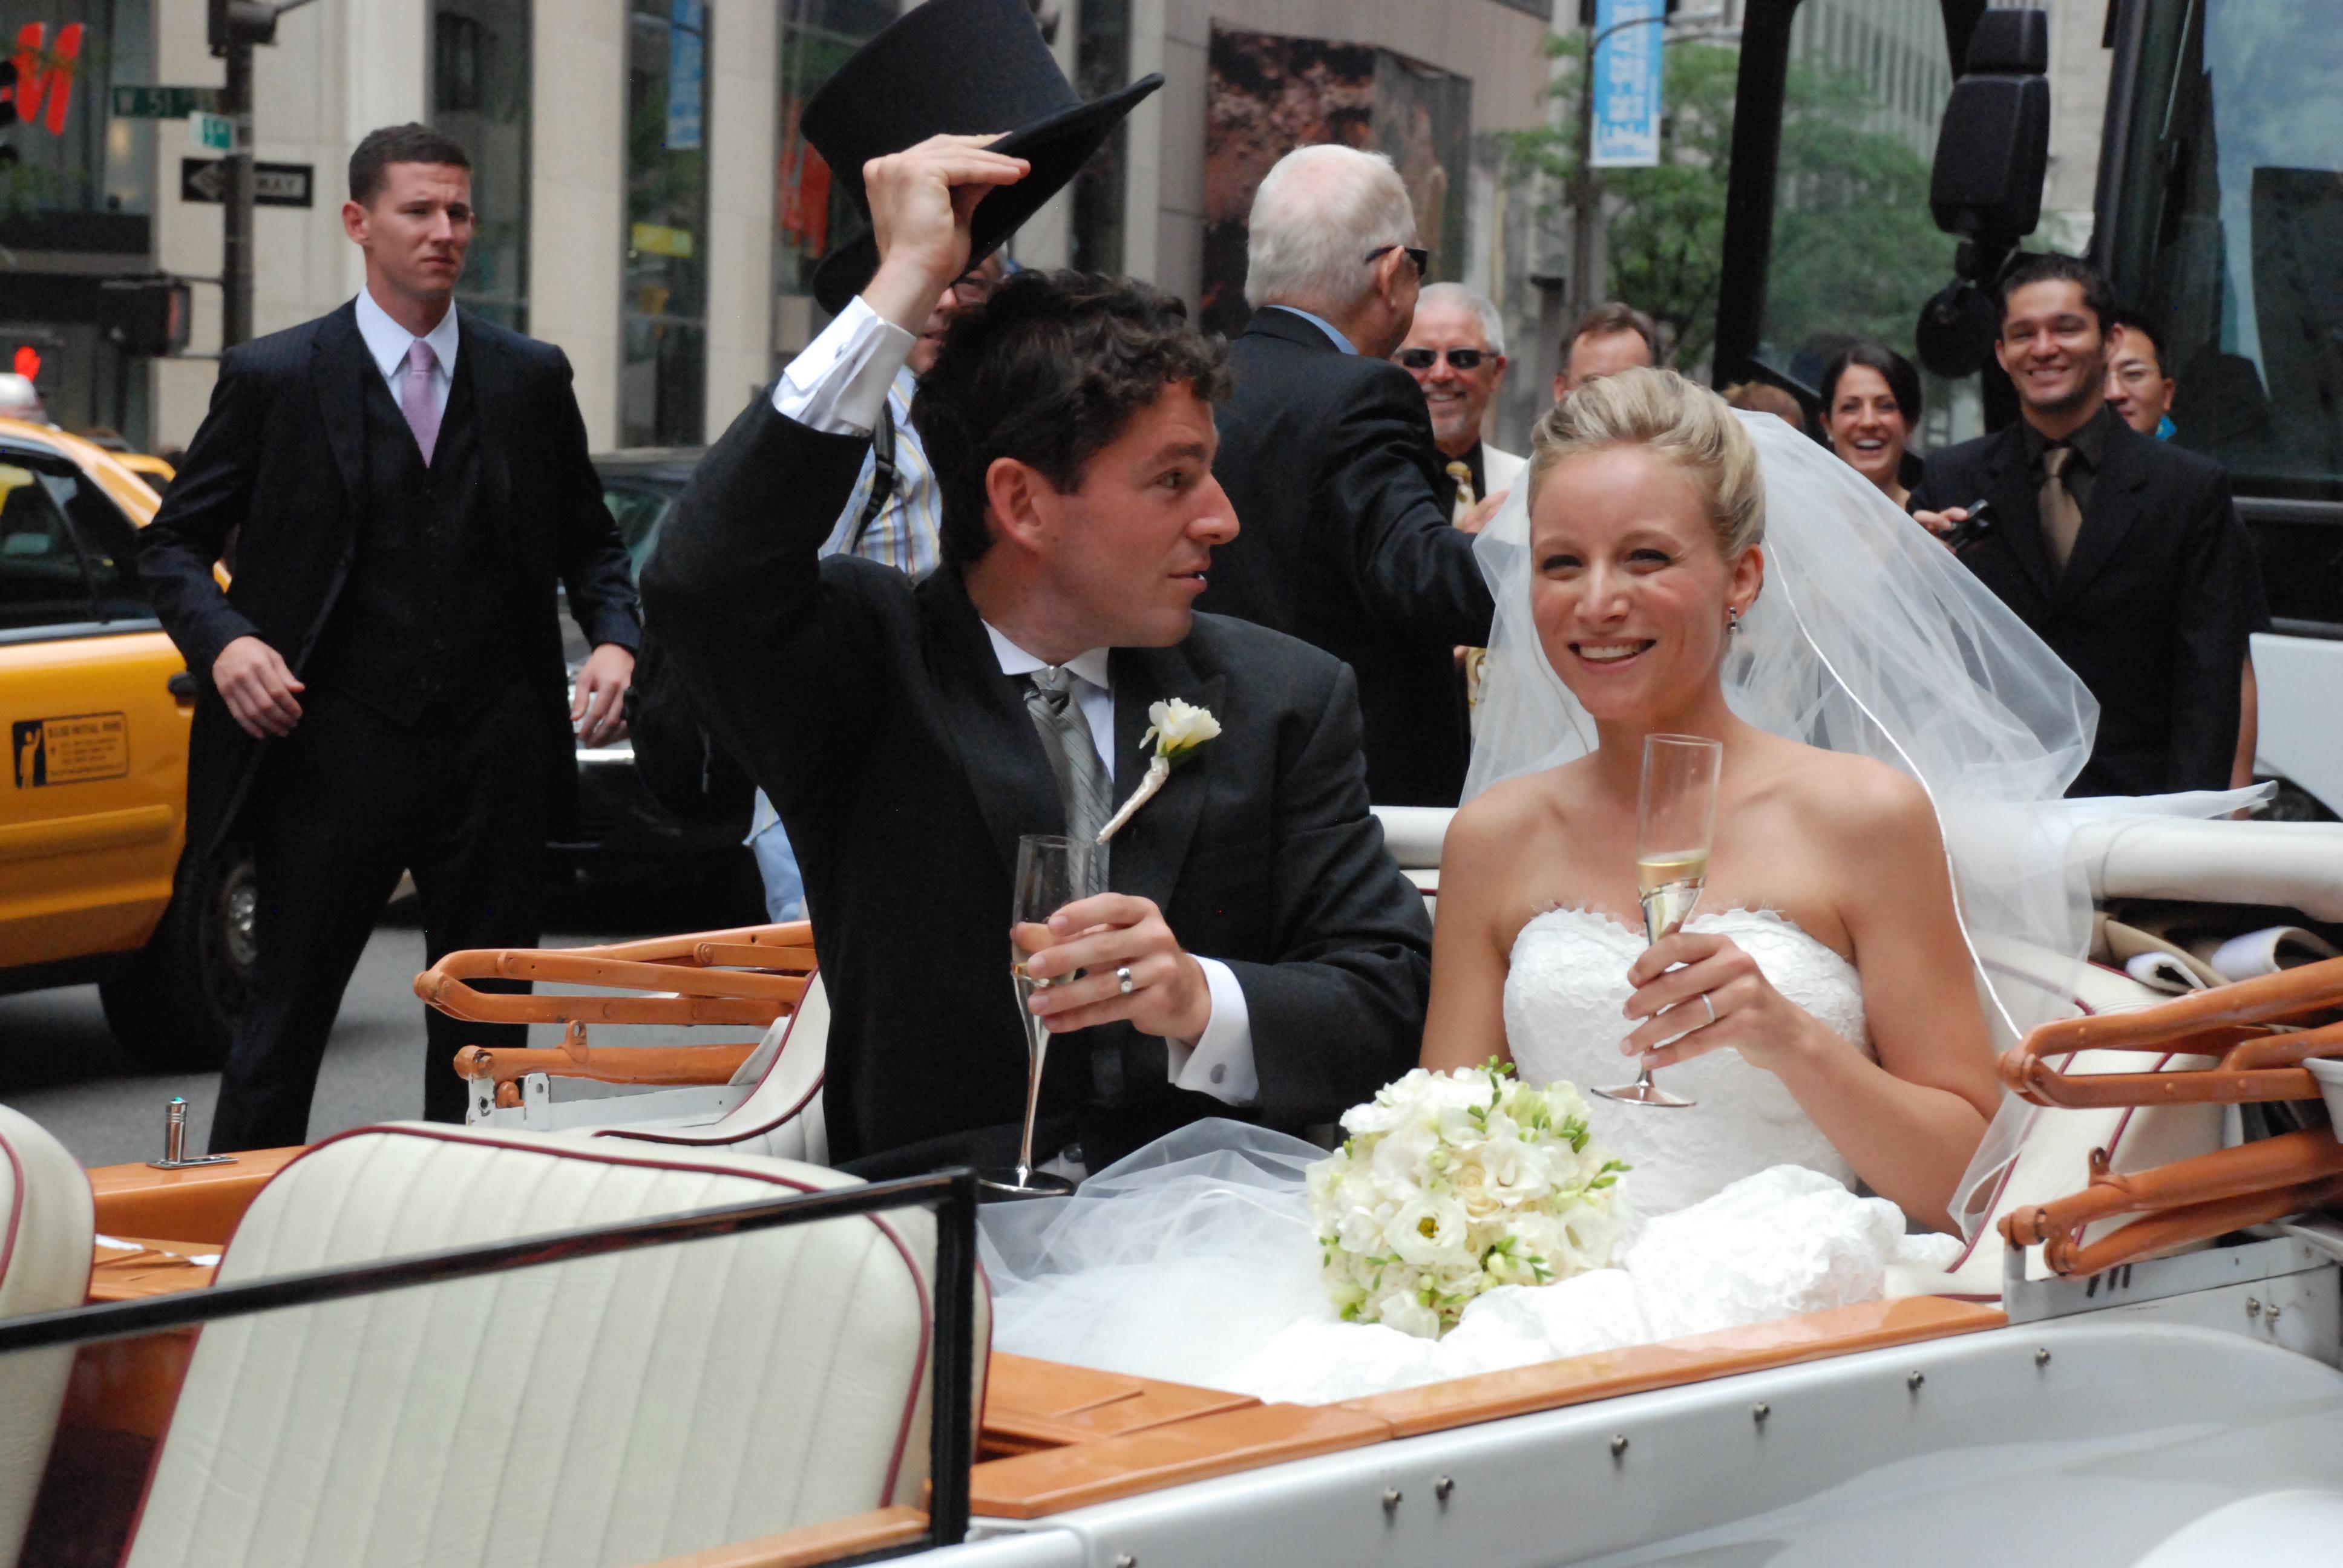 Celebrating A Summer Wedding